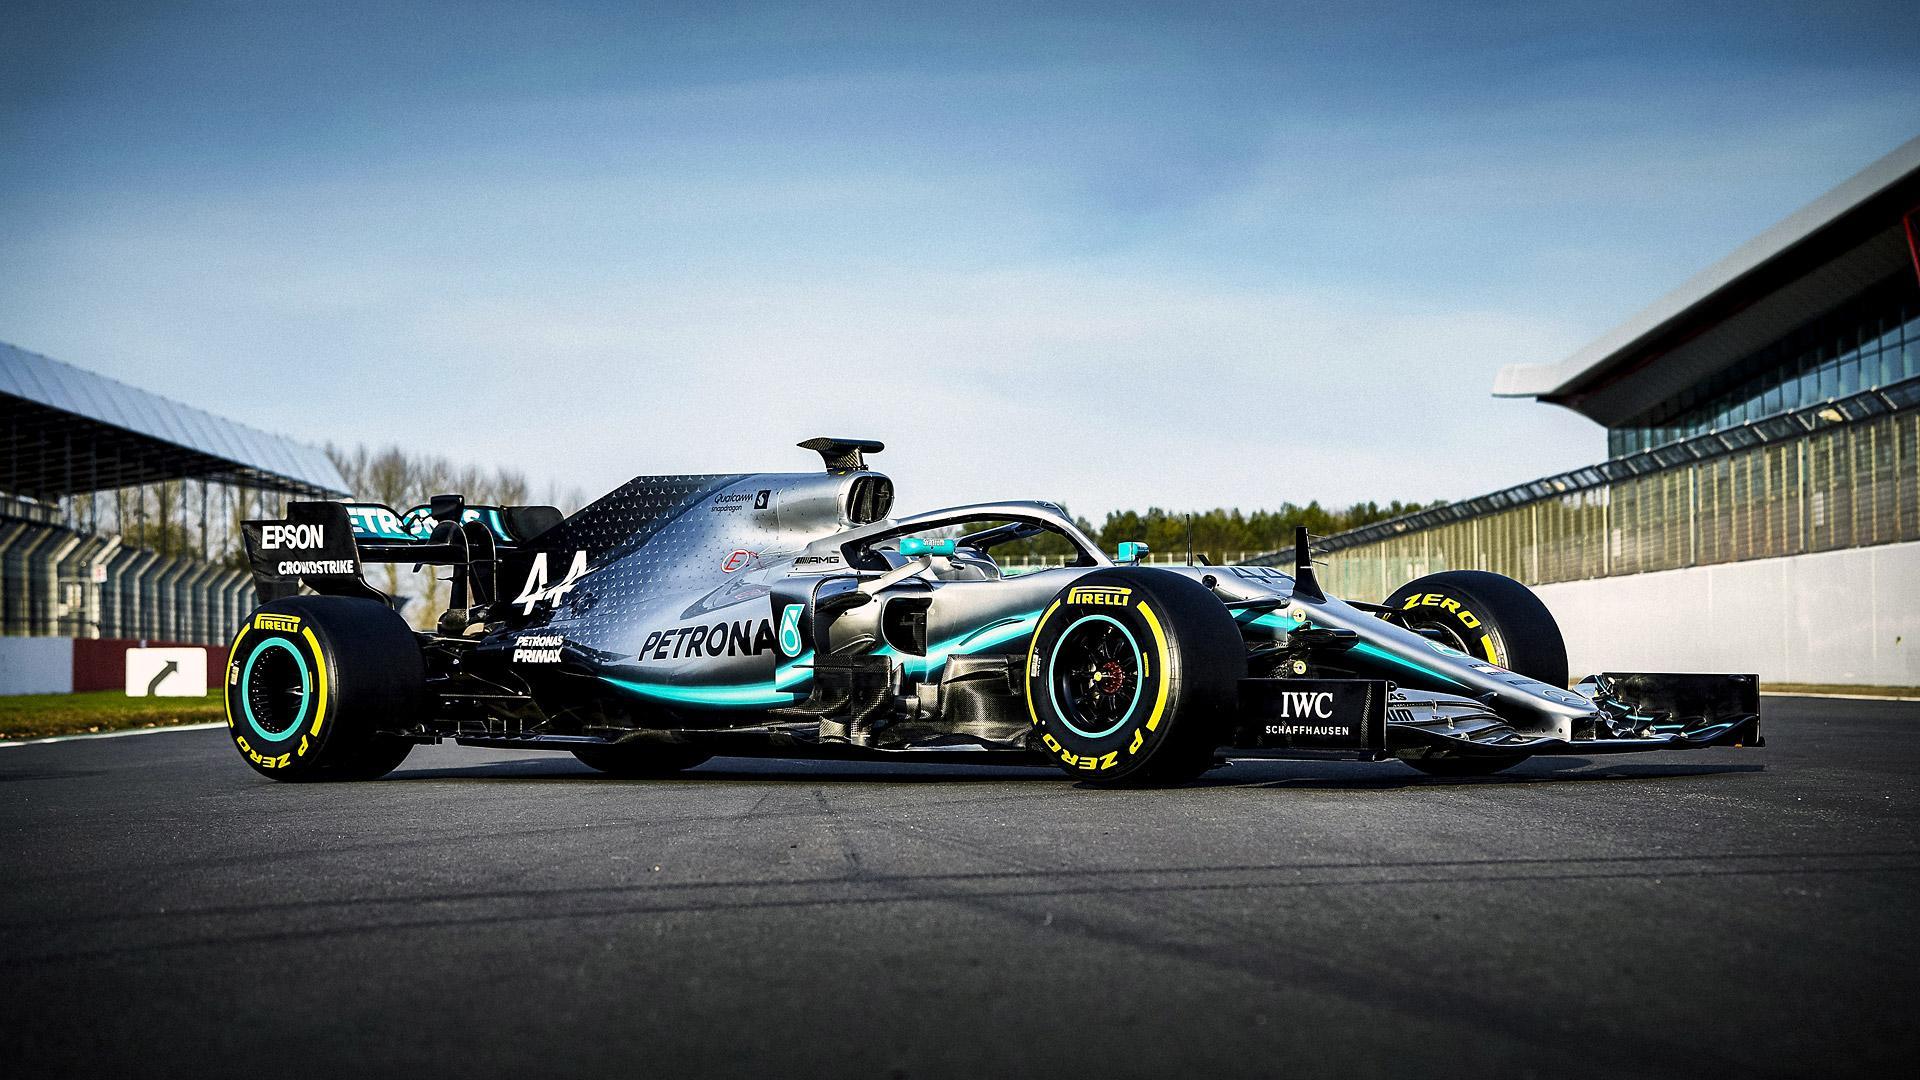 Download Formula 1 Wallpaper Hd Backgrounds Download Itlcat